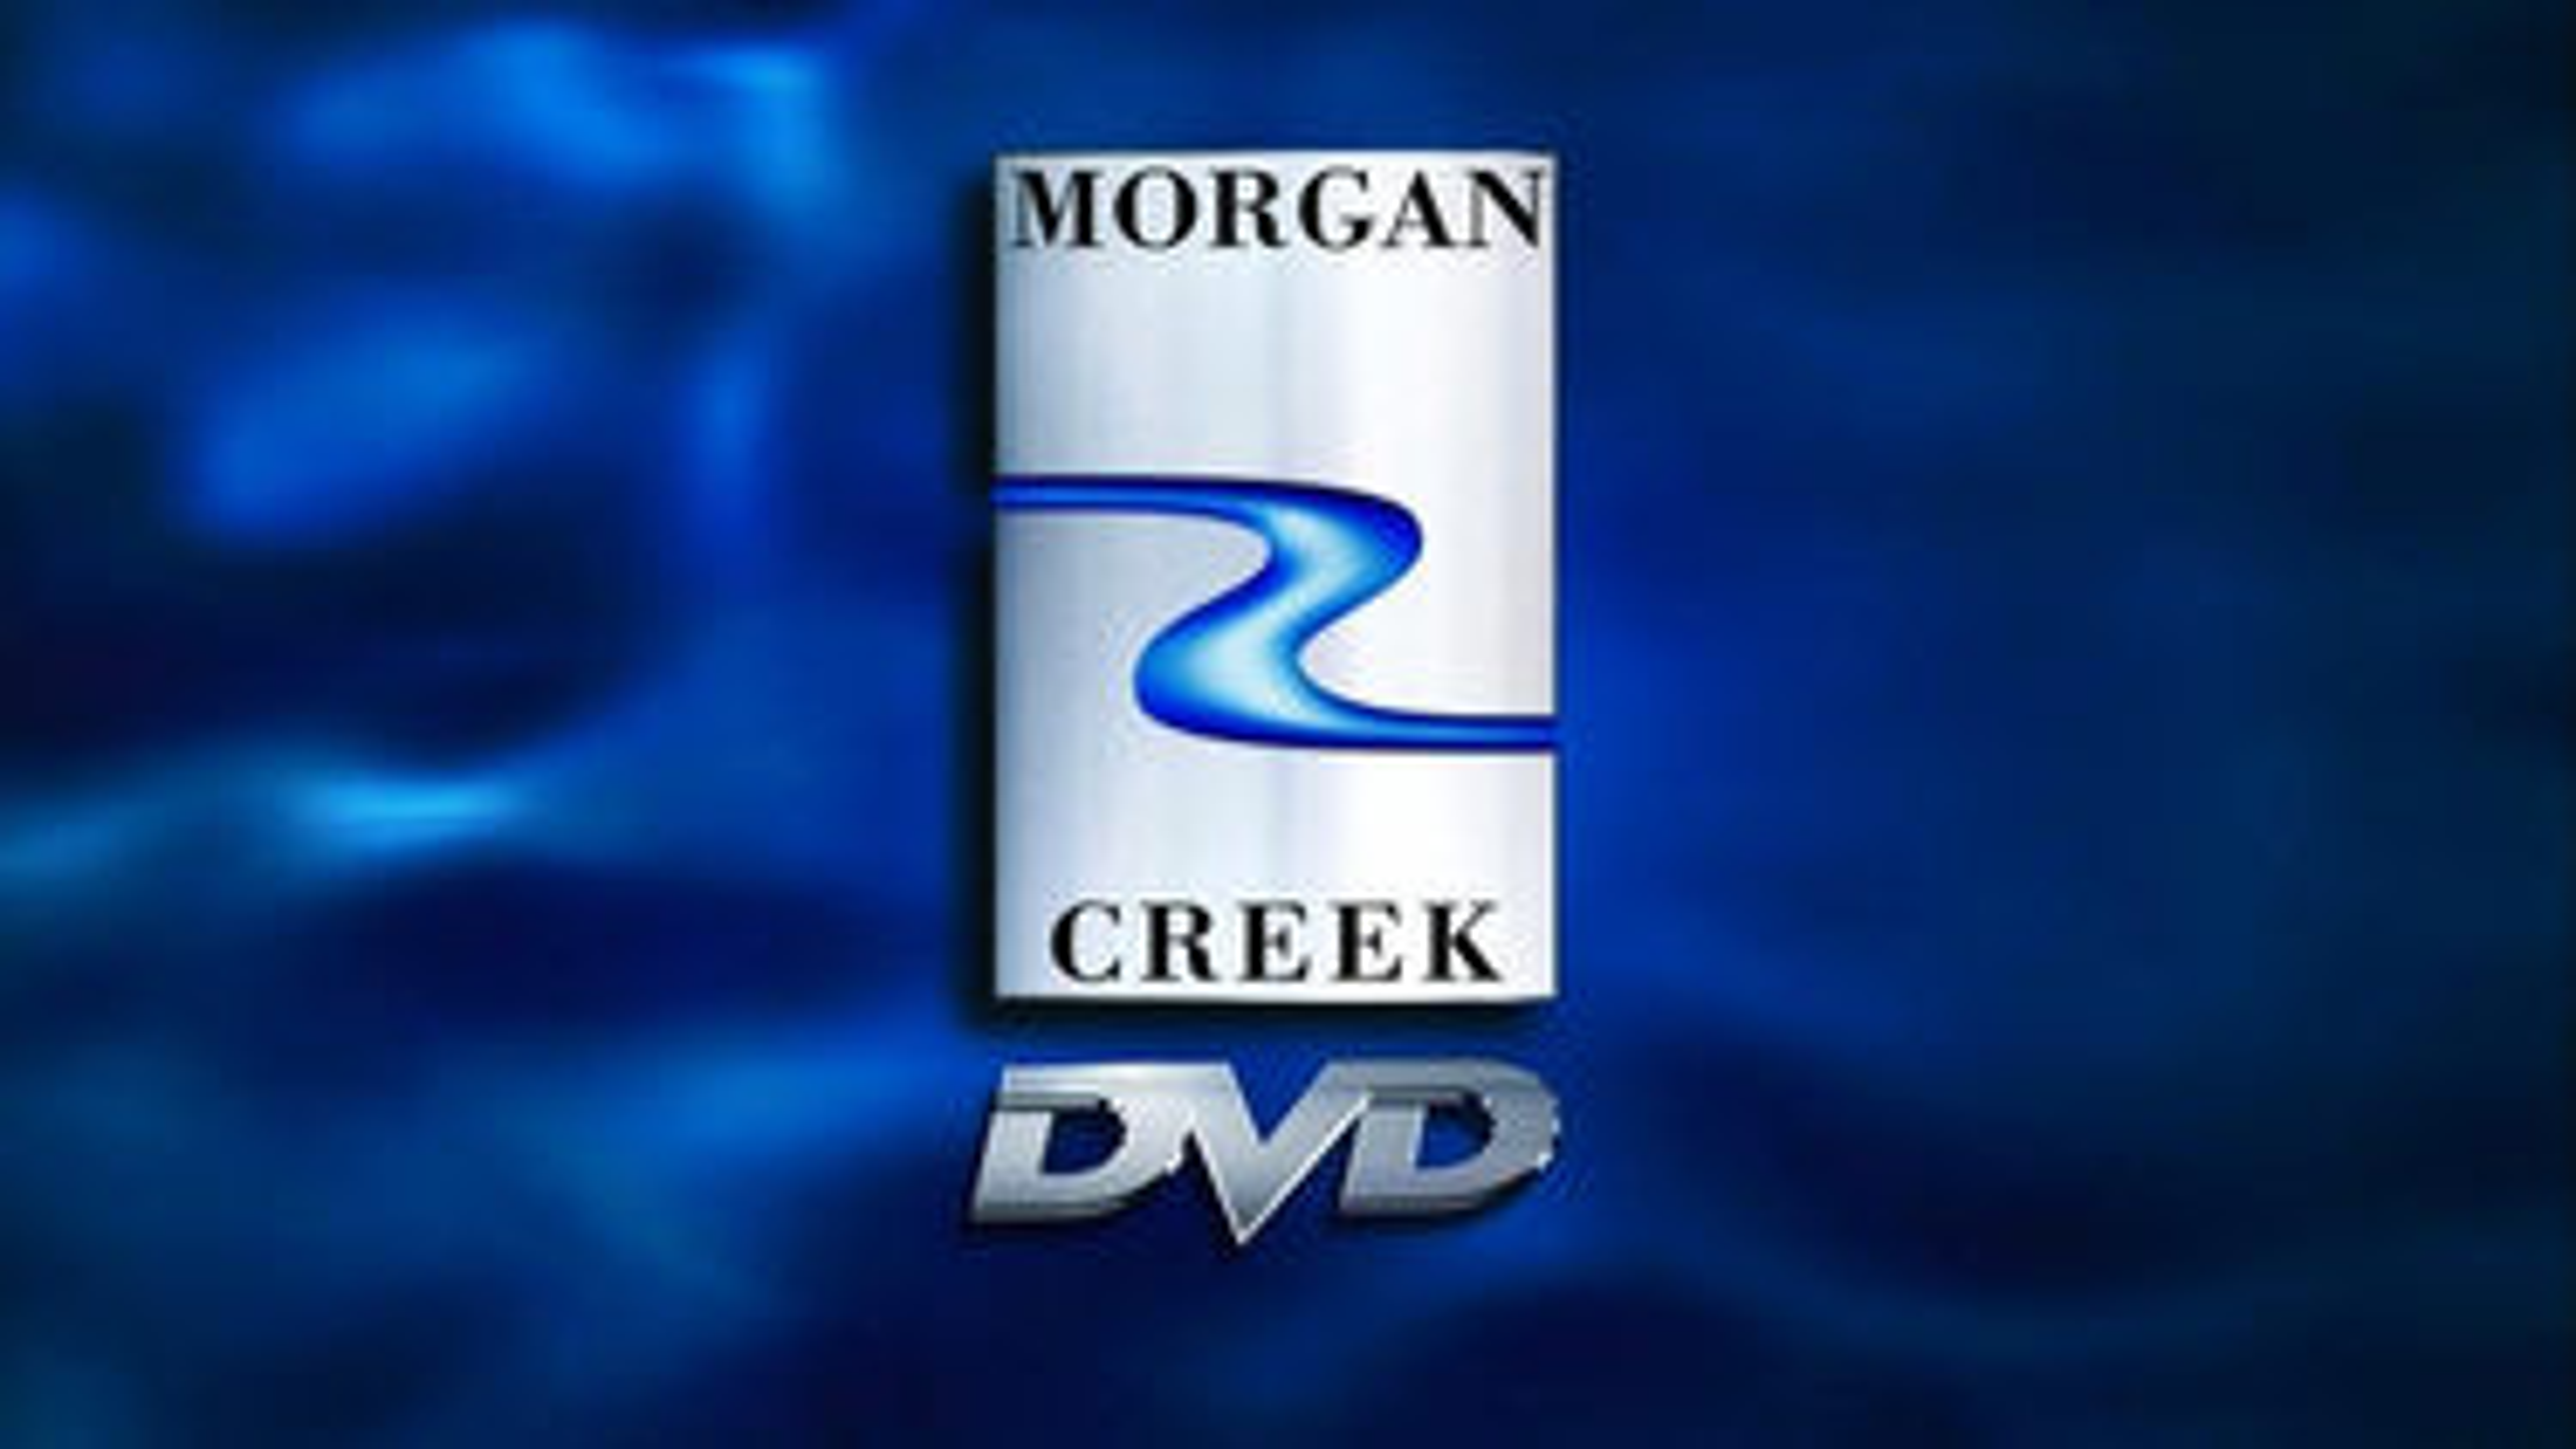 Morgan Creek DVD